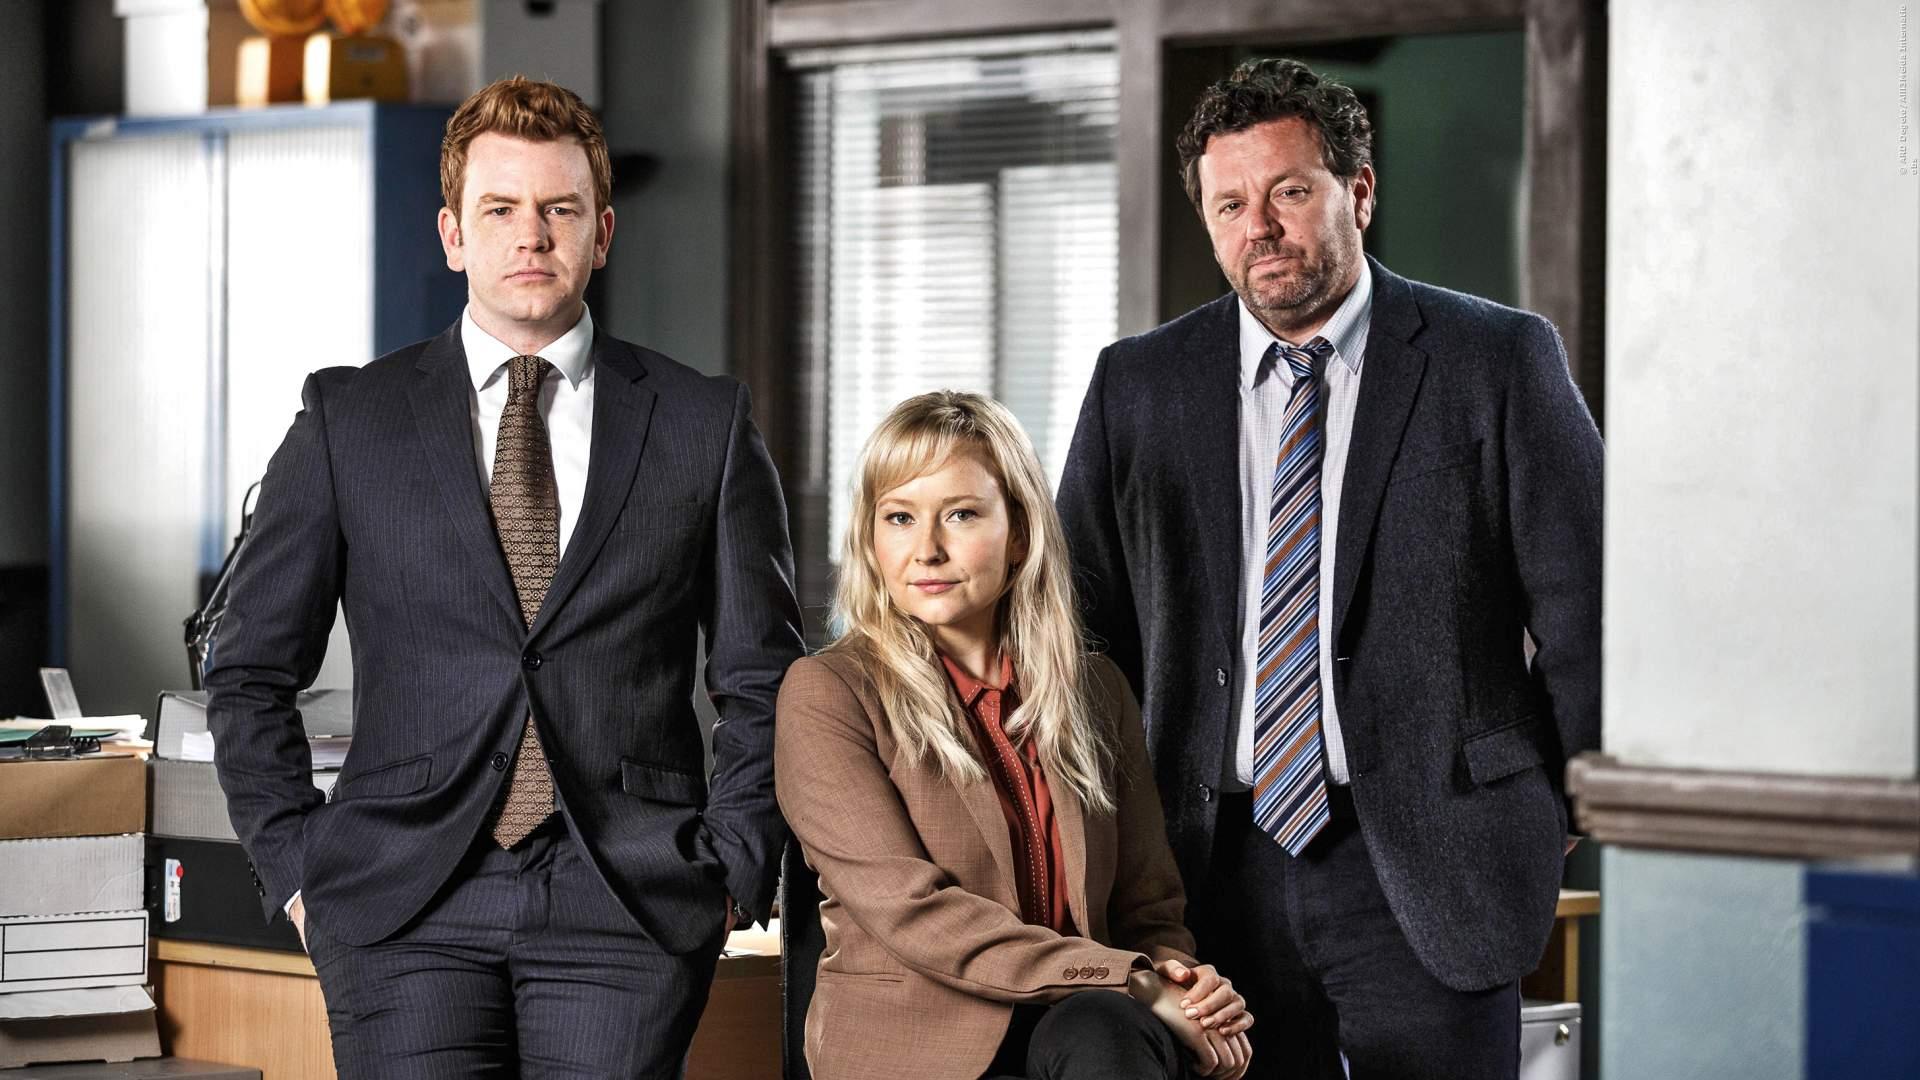 BROKENWOOD: Mord in Neuseeland - Staffel 2 startet im TV